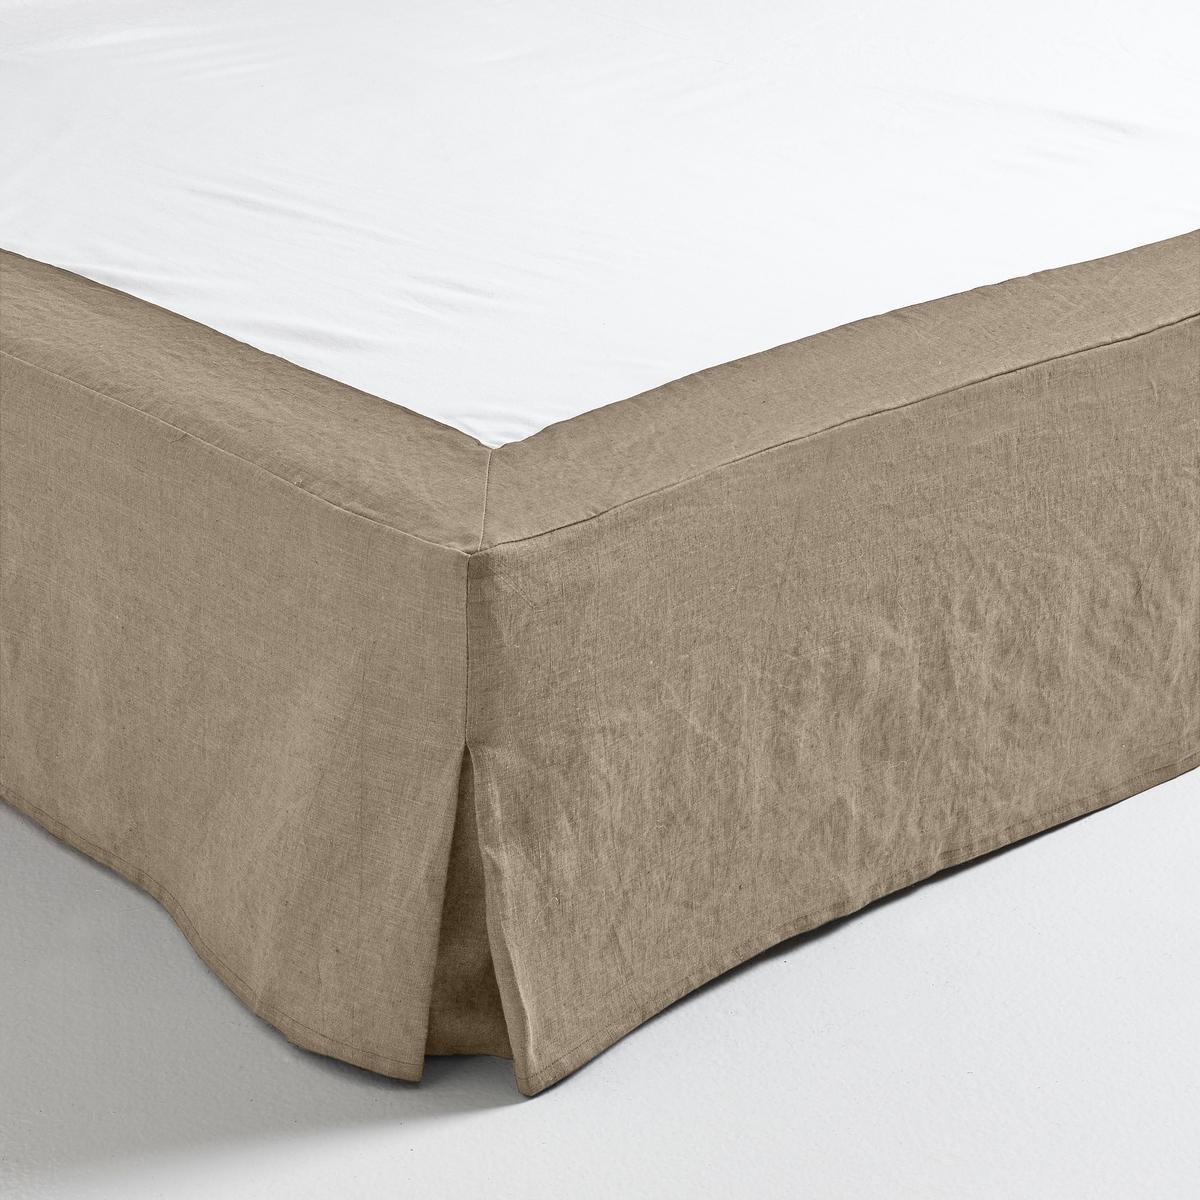 Чехол La Redoute Для кровати из пенькихлопка Lino 180 x 200 см бежевый